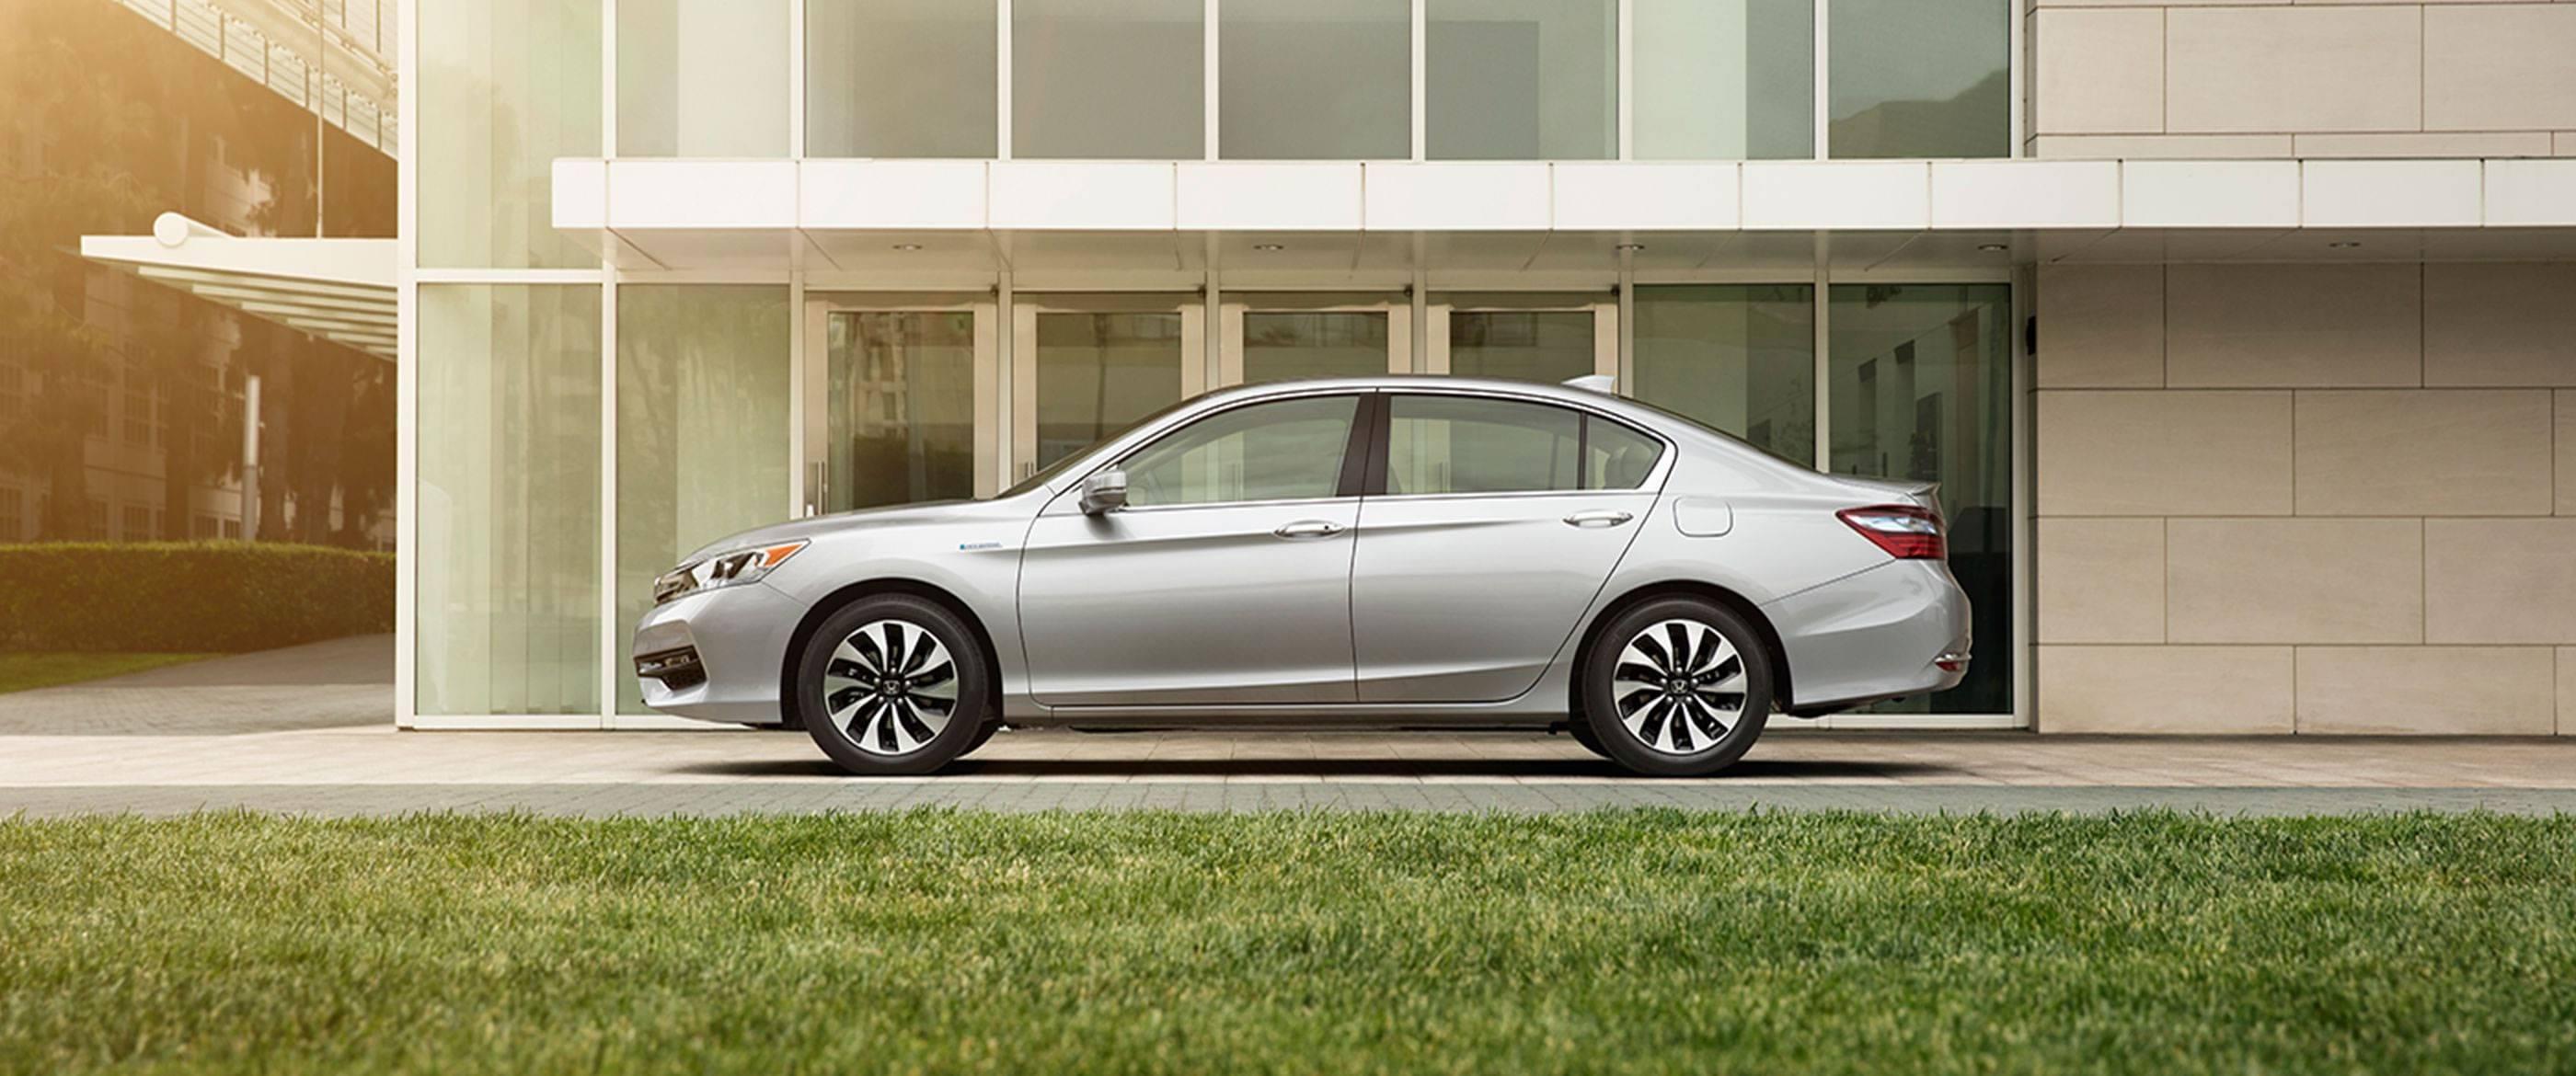 2017 Honda Accord Hybrid Silver Side Exterior